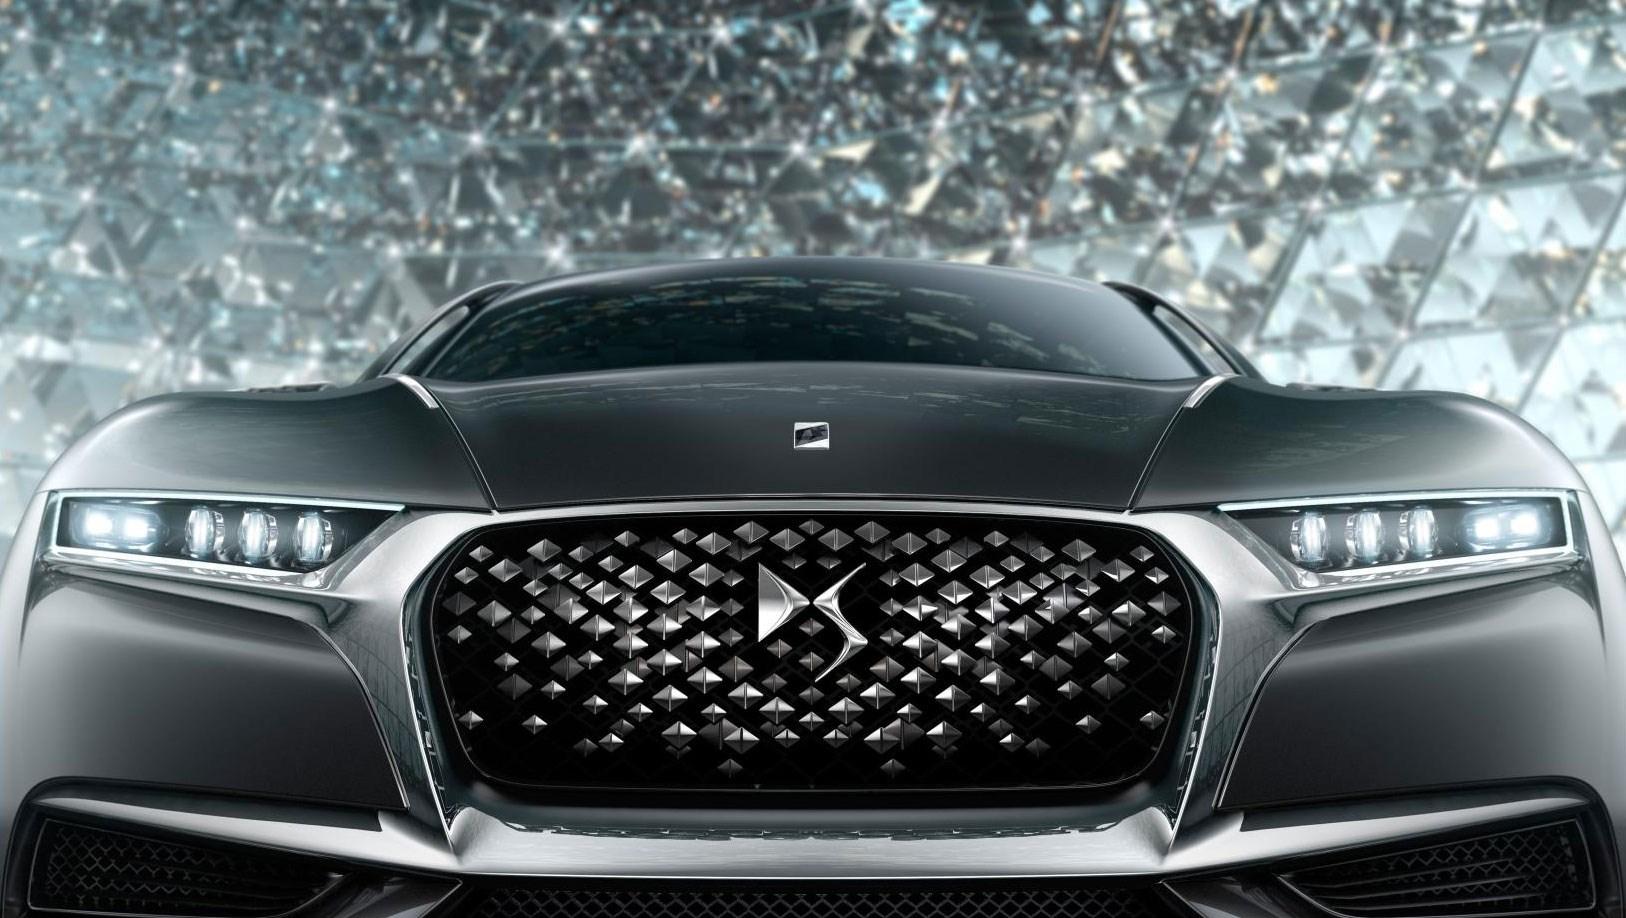 citroen 39 plotting new ds8 range topper for 2018 39 car. Black Bedroom Furniture Sets. Home Design Ideas